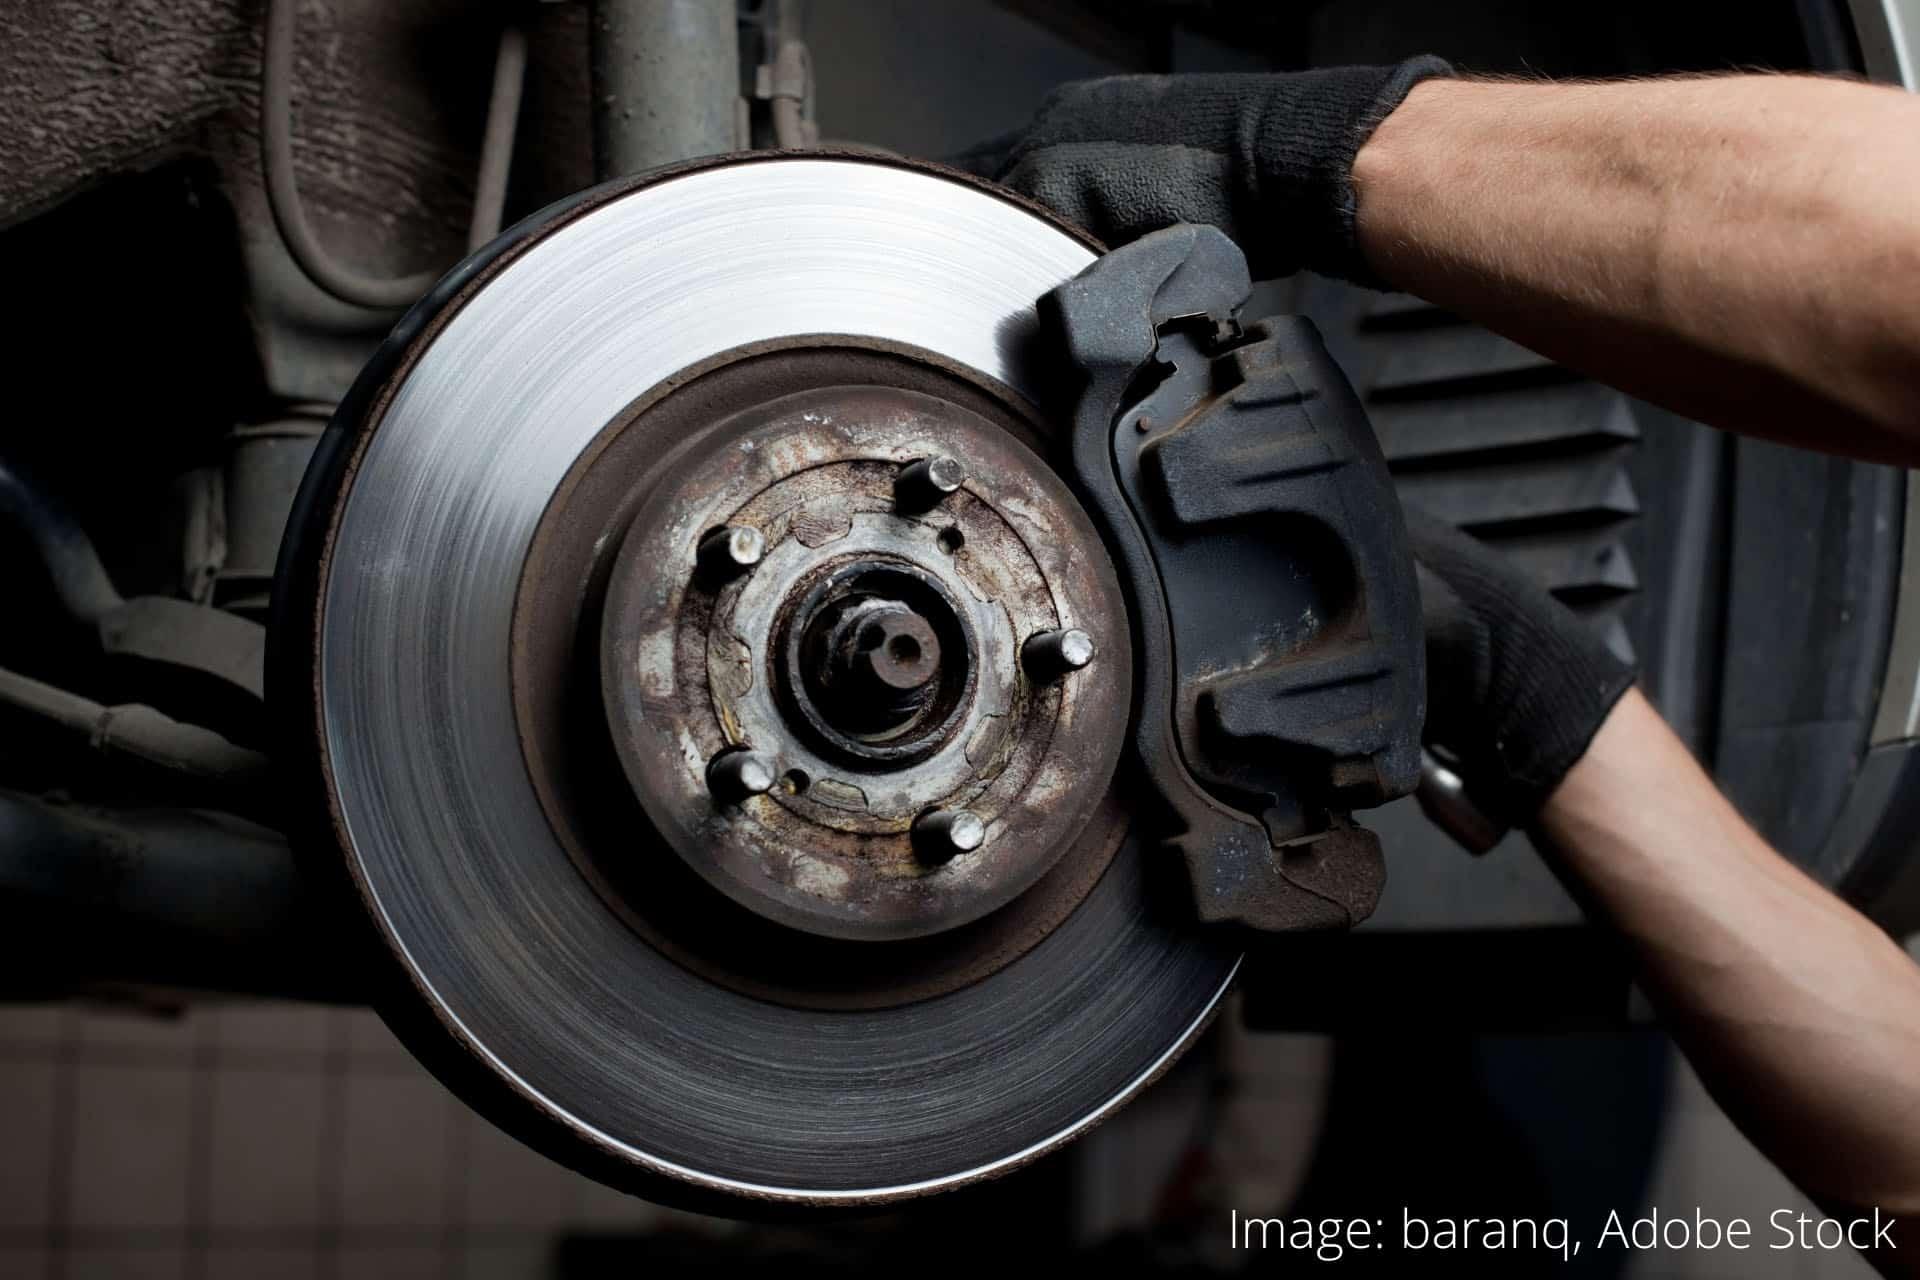 Повдигане на автомобила и сваляне на гумите